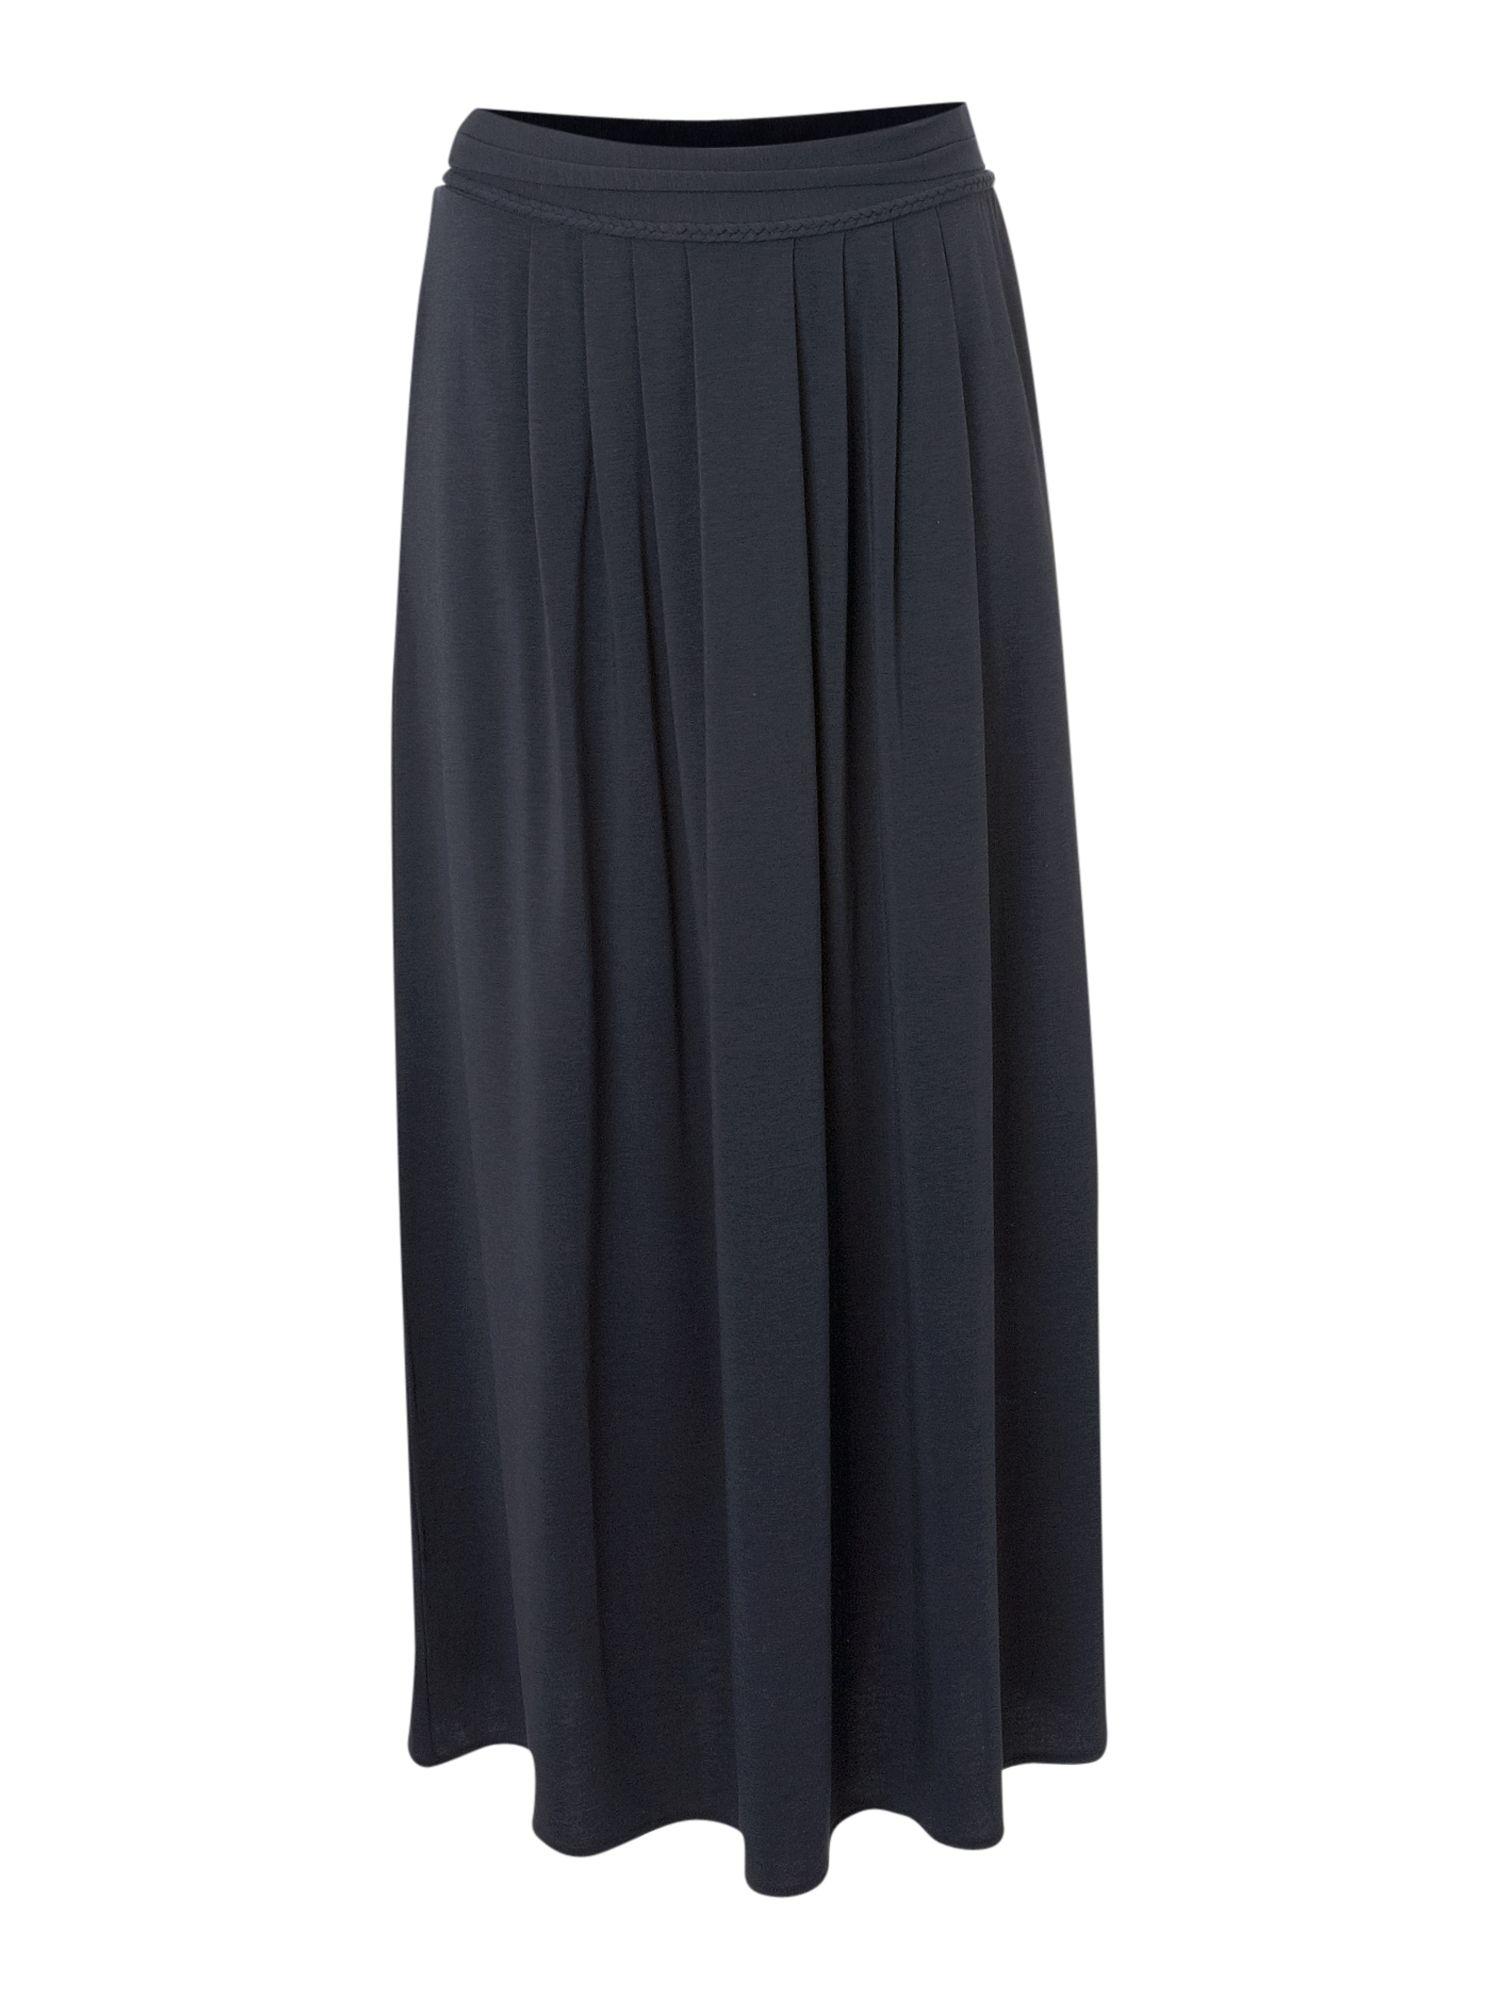 weekend by maxmara caden jersey maxi skirt in black lyst